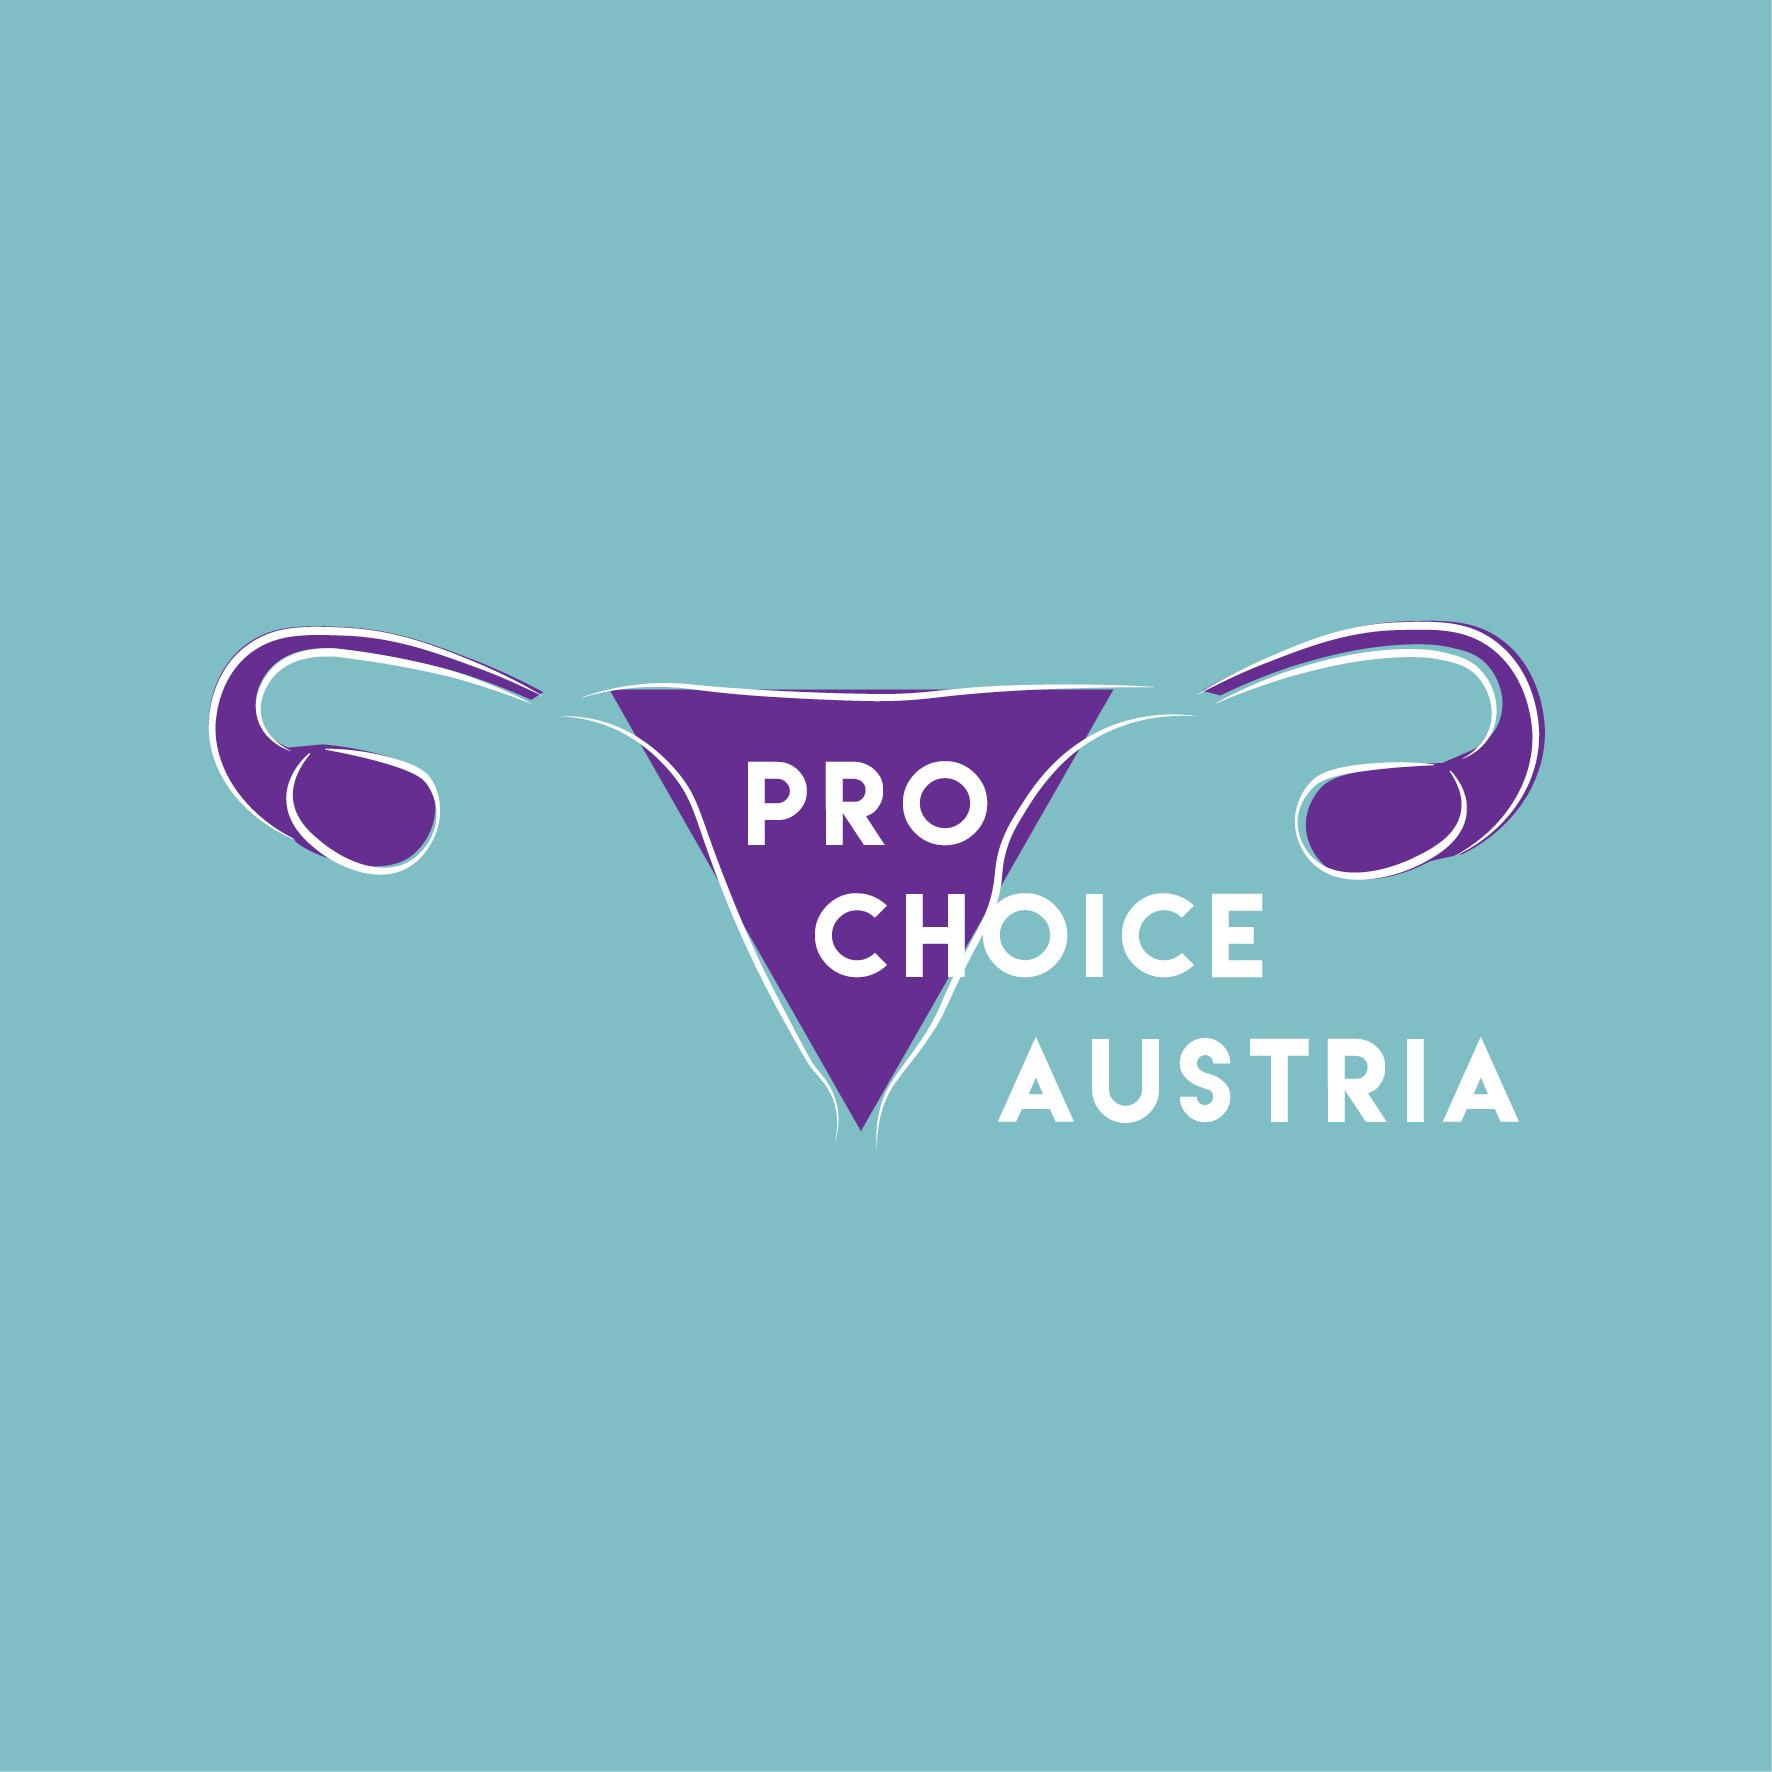 Pro Choice Austria